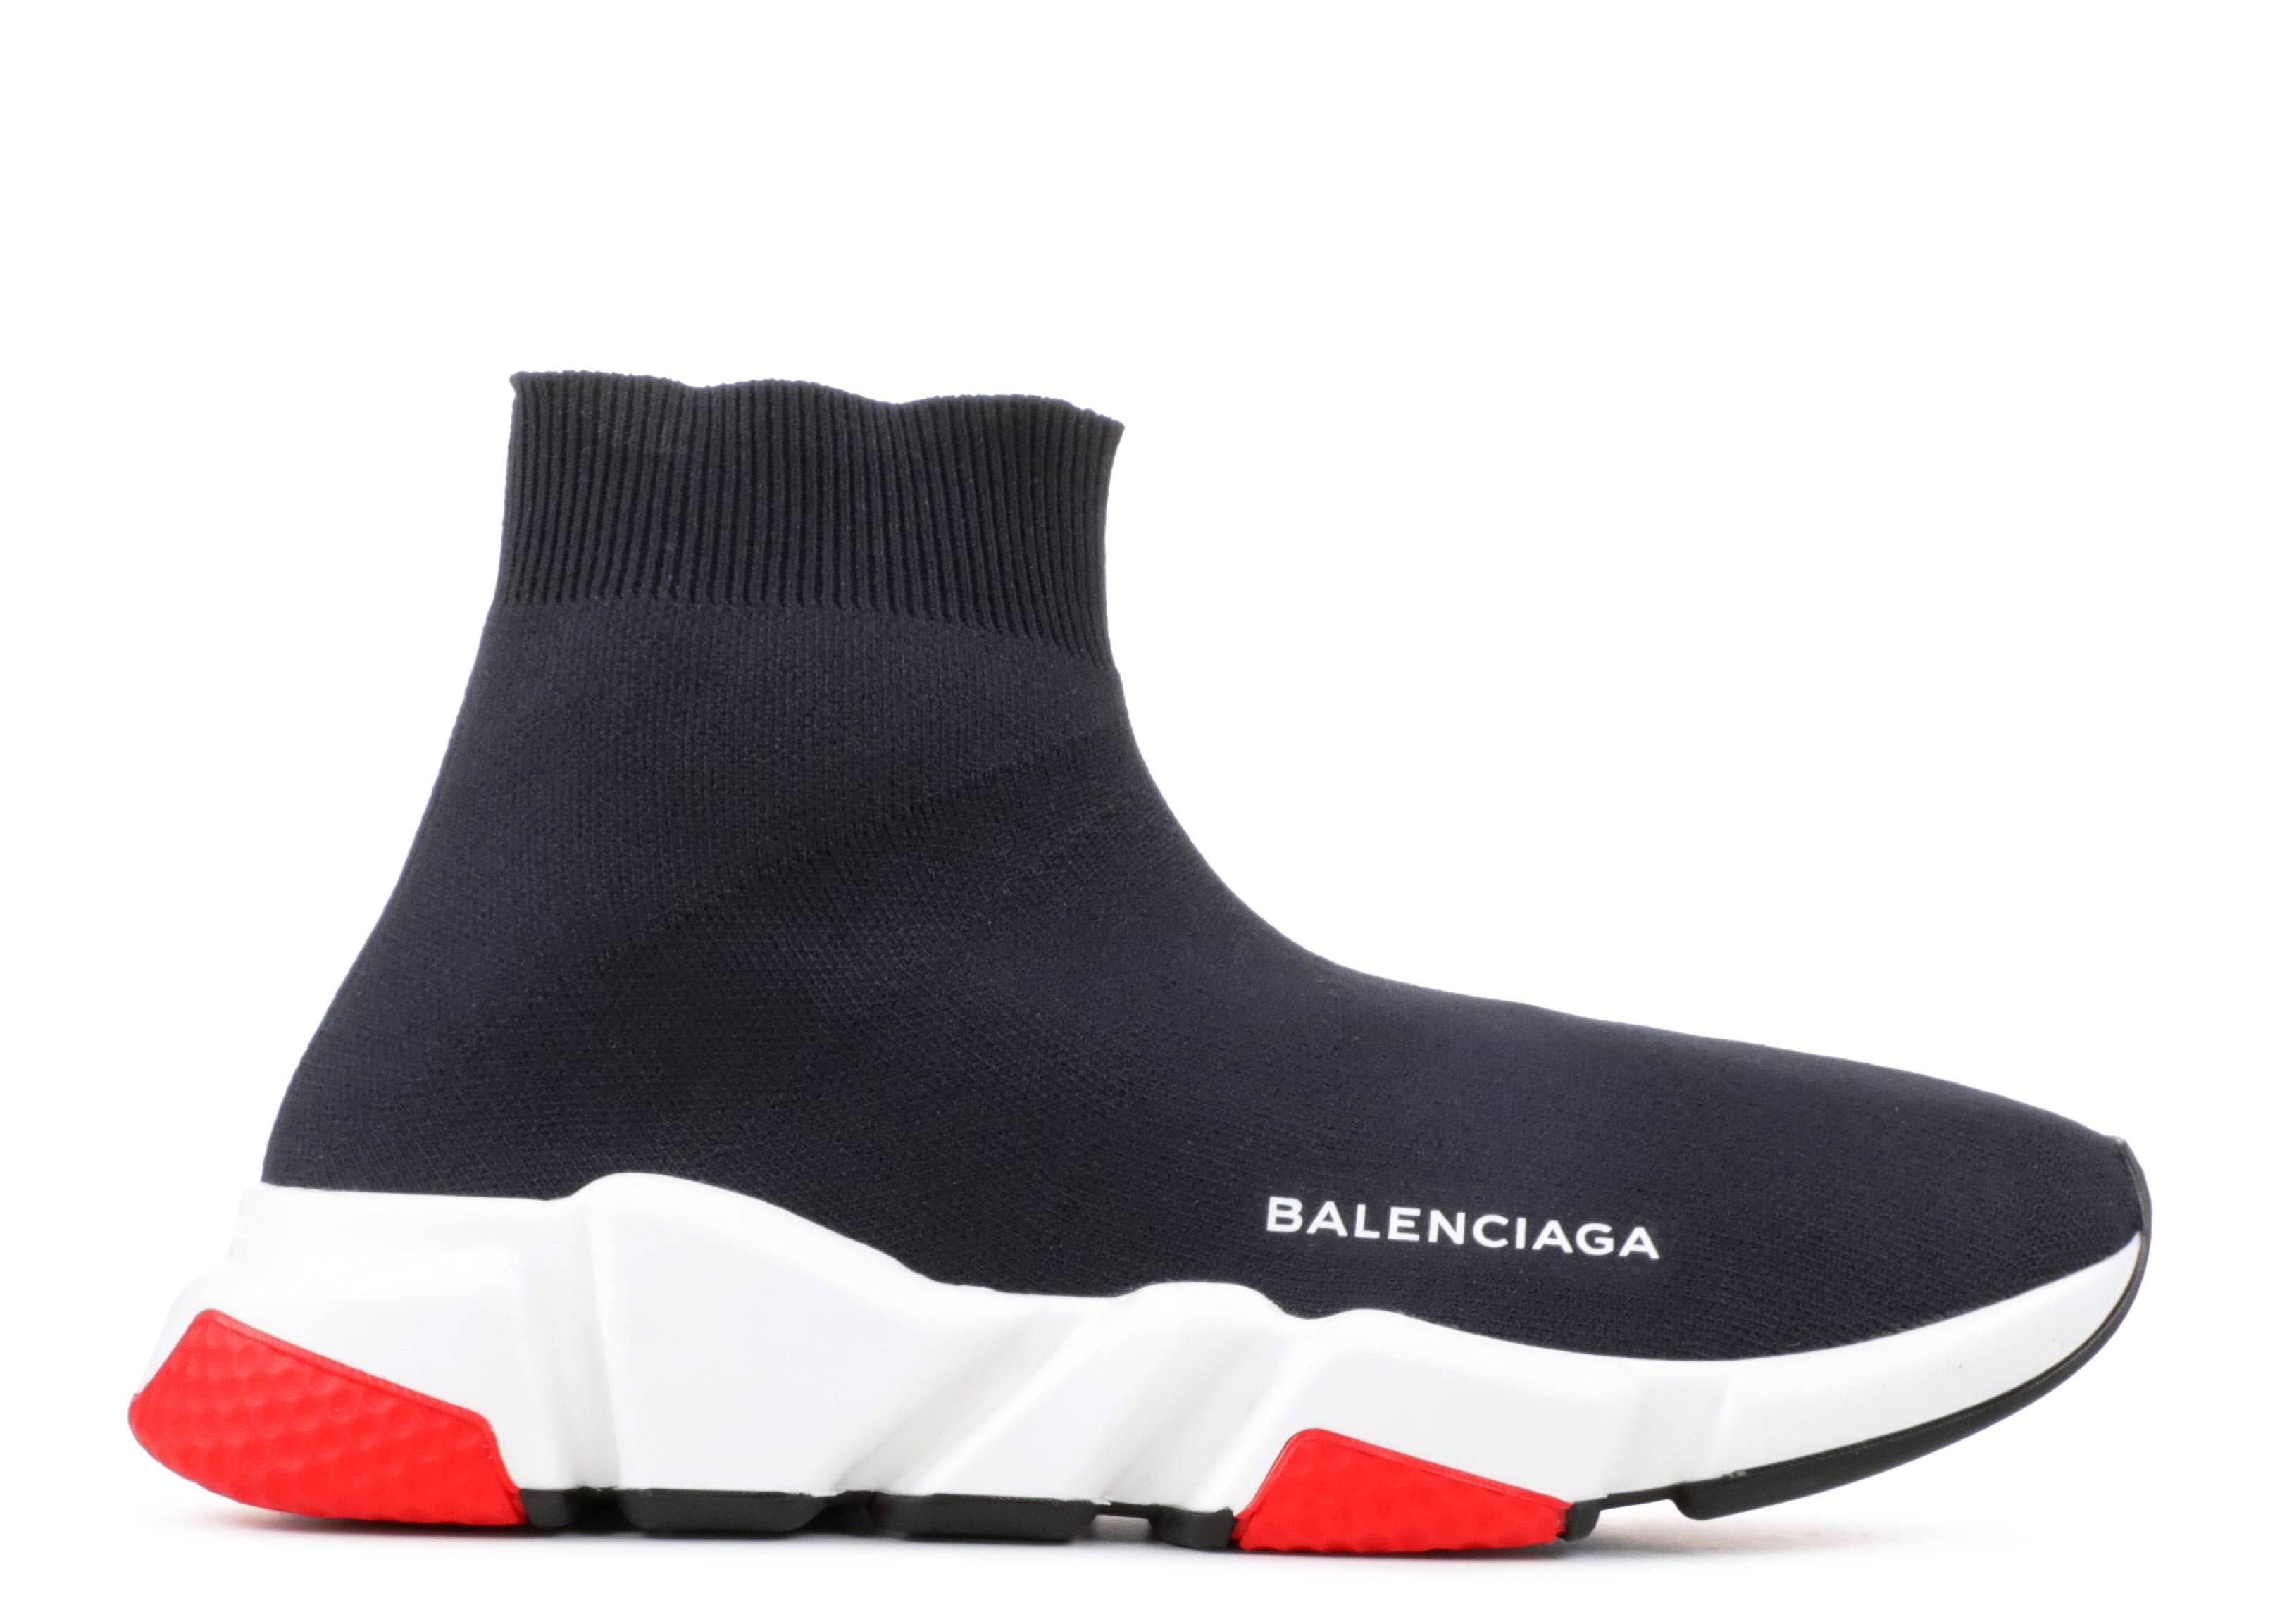 fcc5276500f Balenciaga Speed Trainer - Balenciaga - 500620W05G01249 - blk/white ...